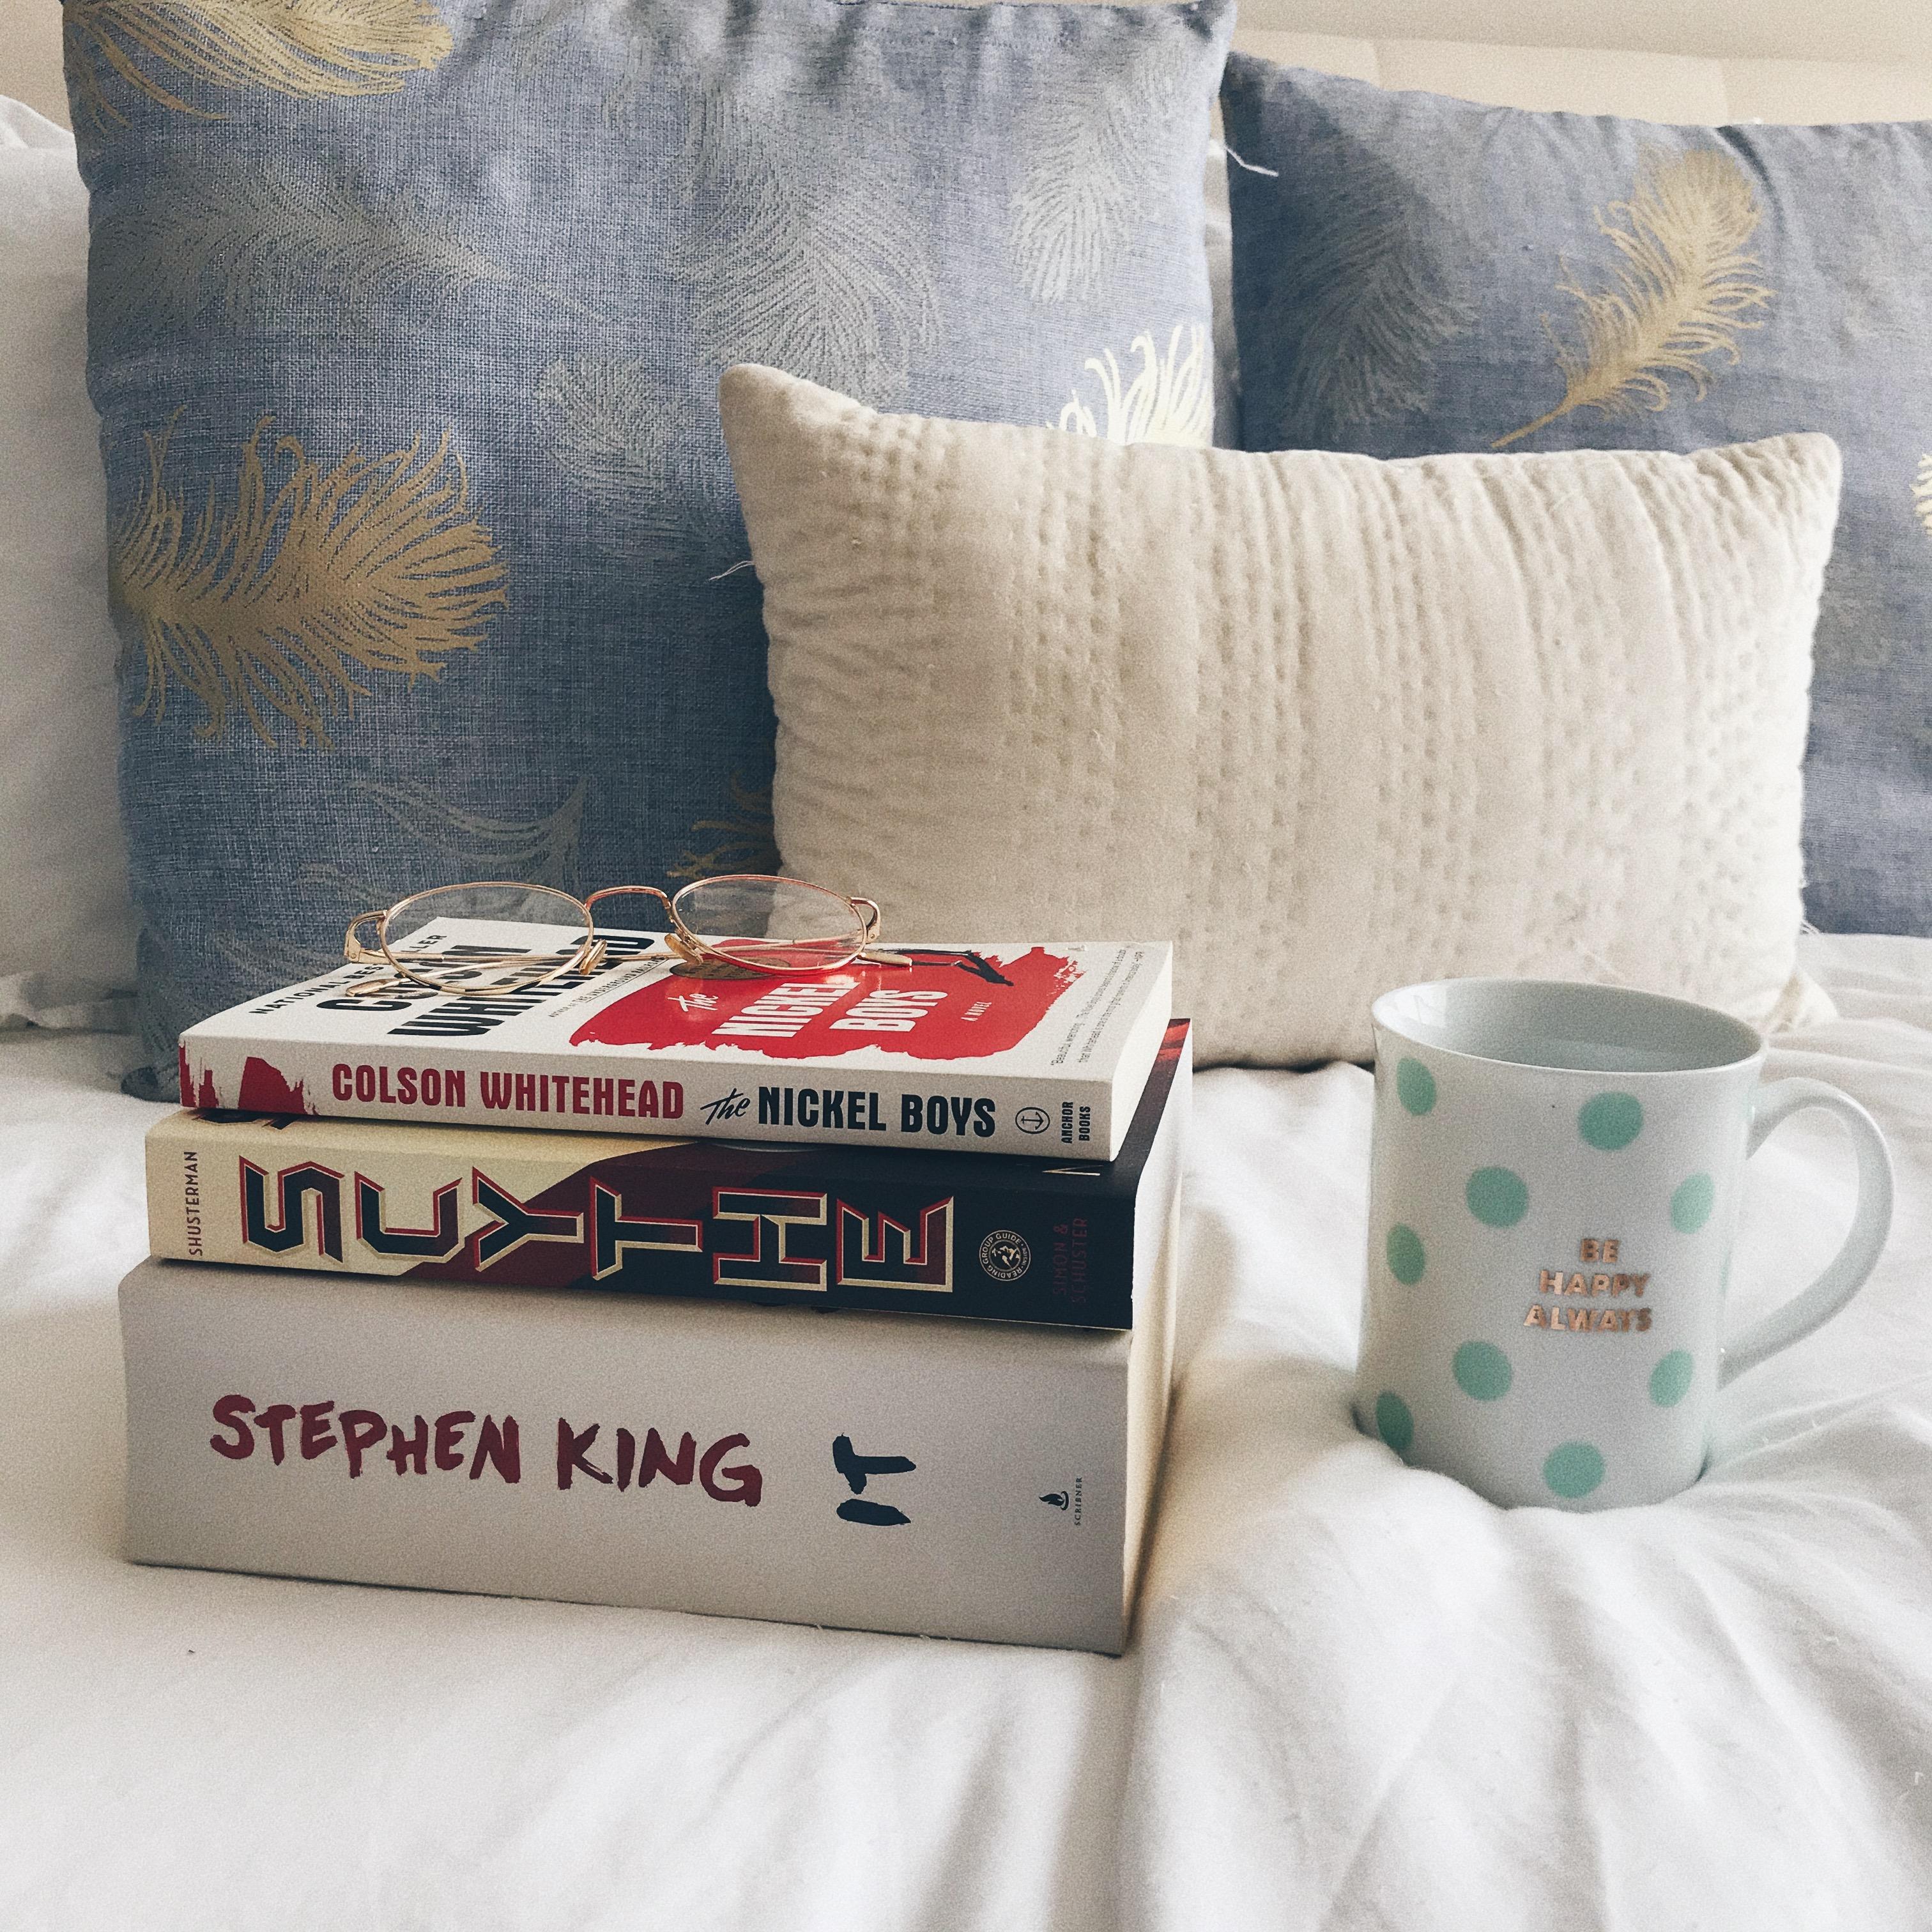 Top 5 Books of 2020 Thus Far